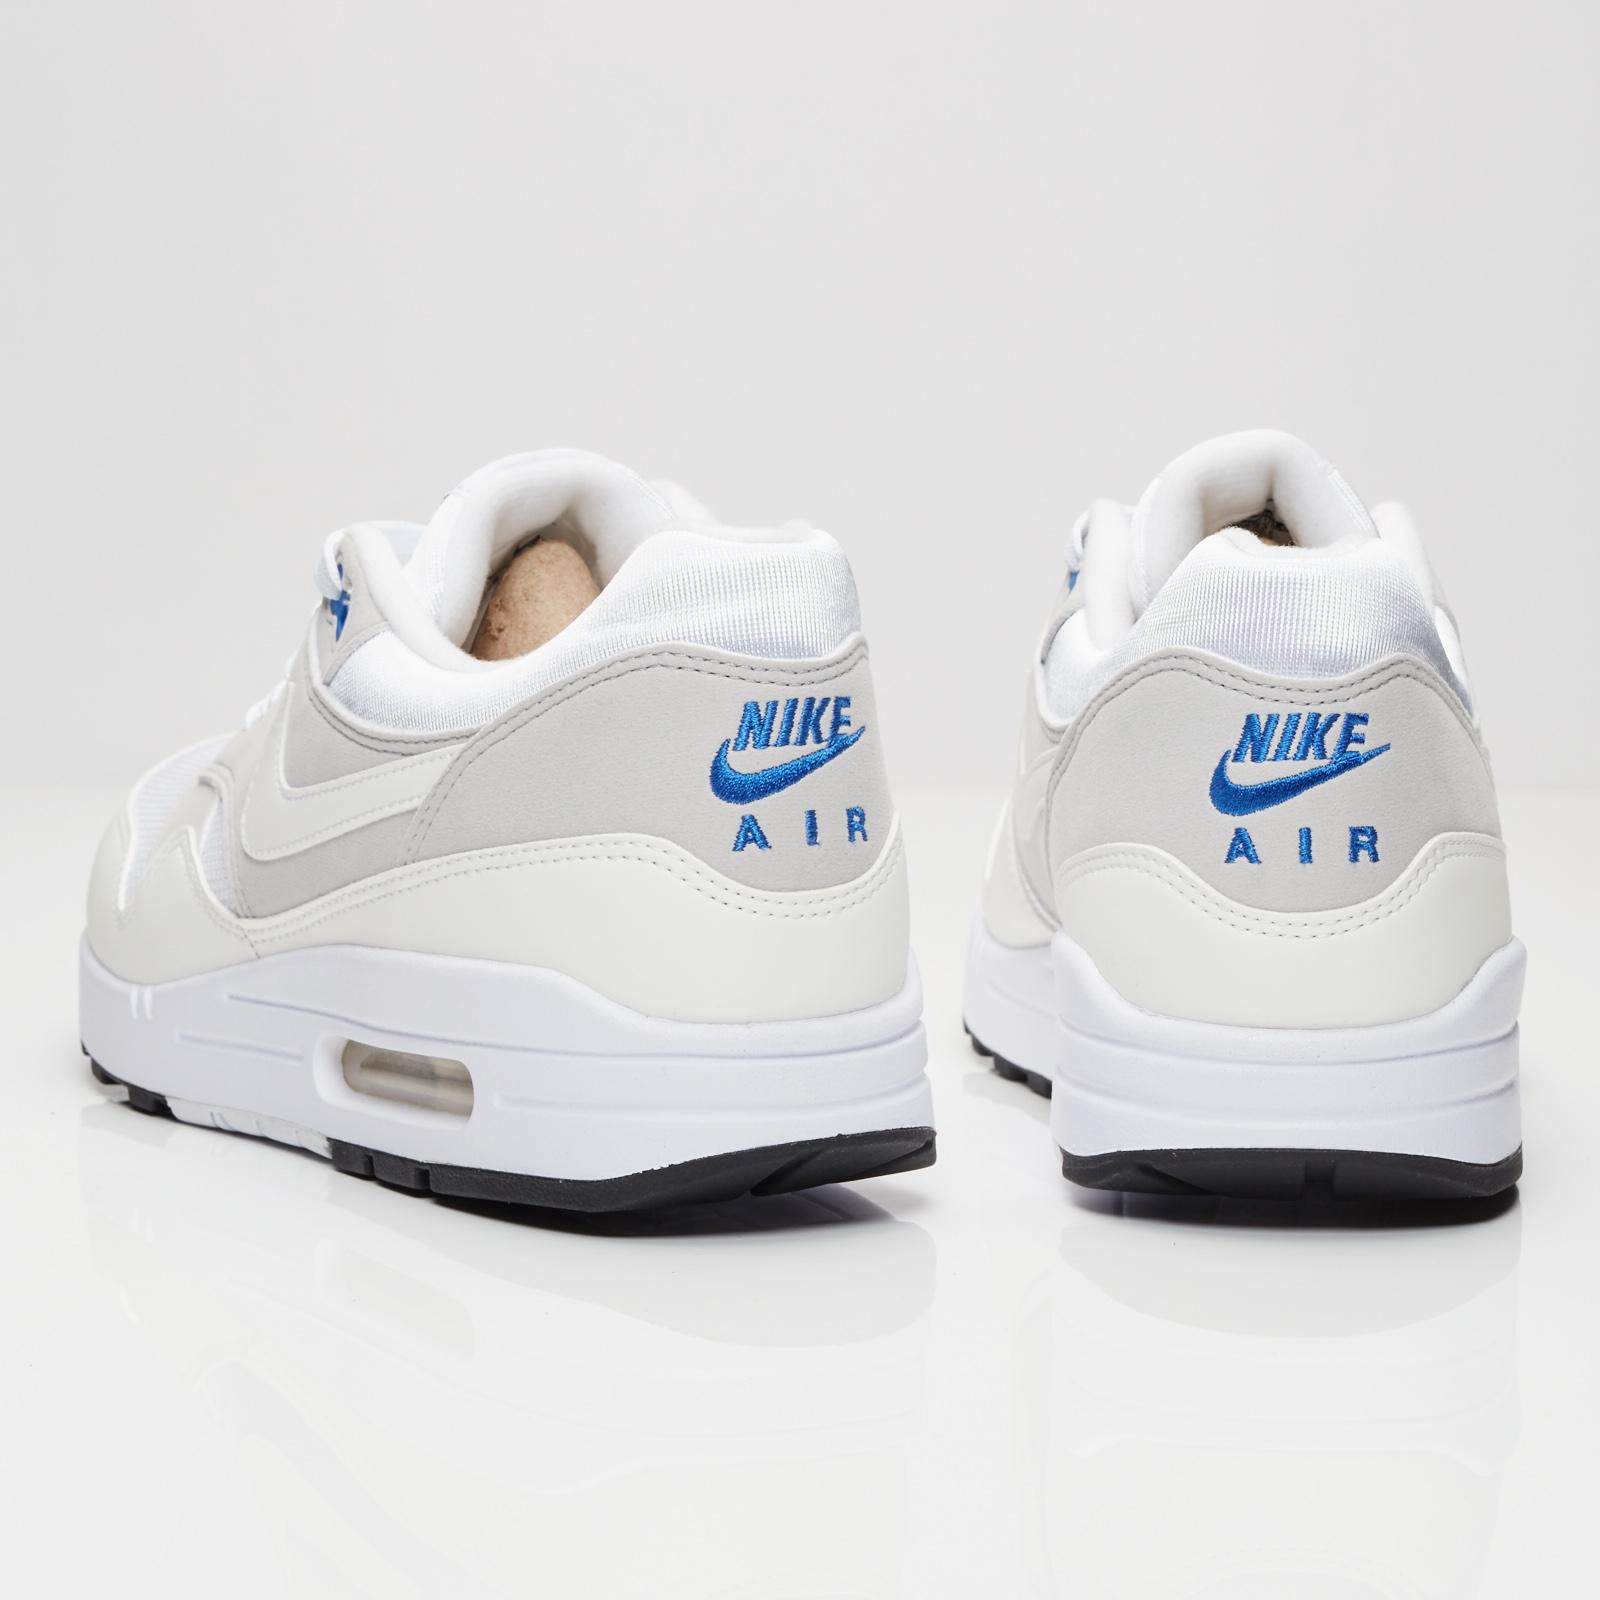 "Genuine Nike Air Max 1 CX ""Color Changing"" 811373 100 Men's"